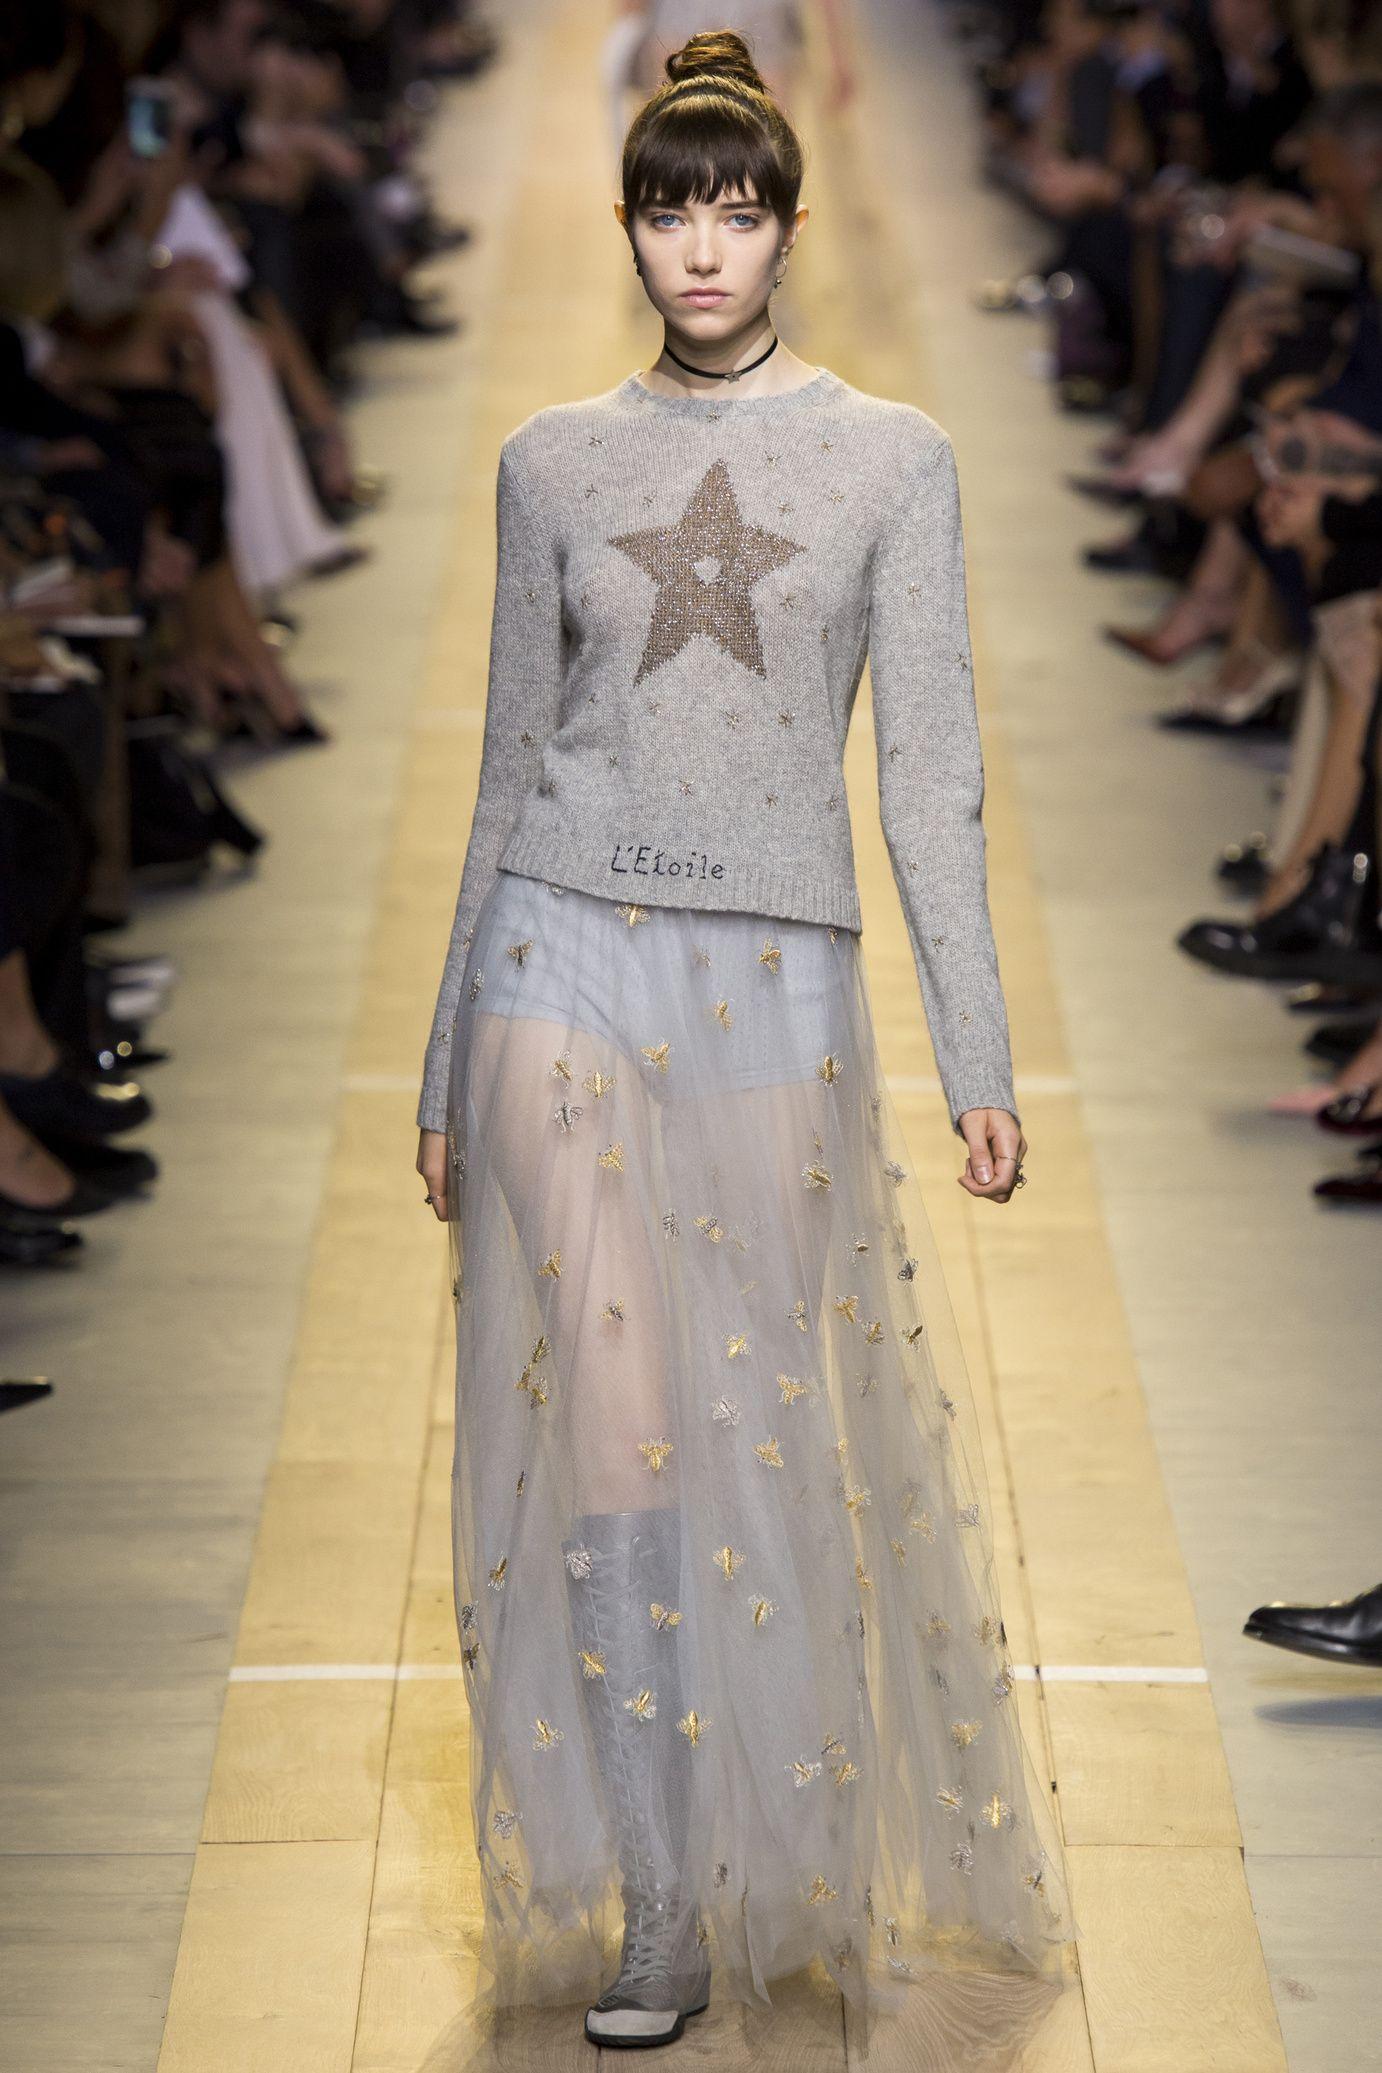 Défilé Christian Dior Printemps-été 2017 55